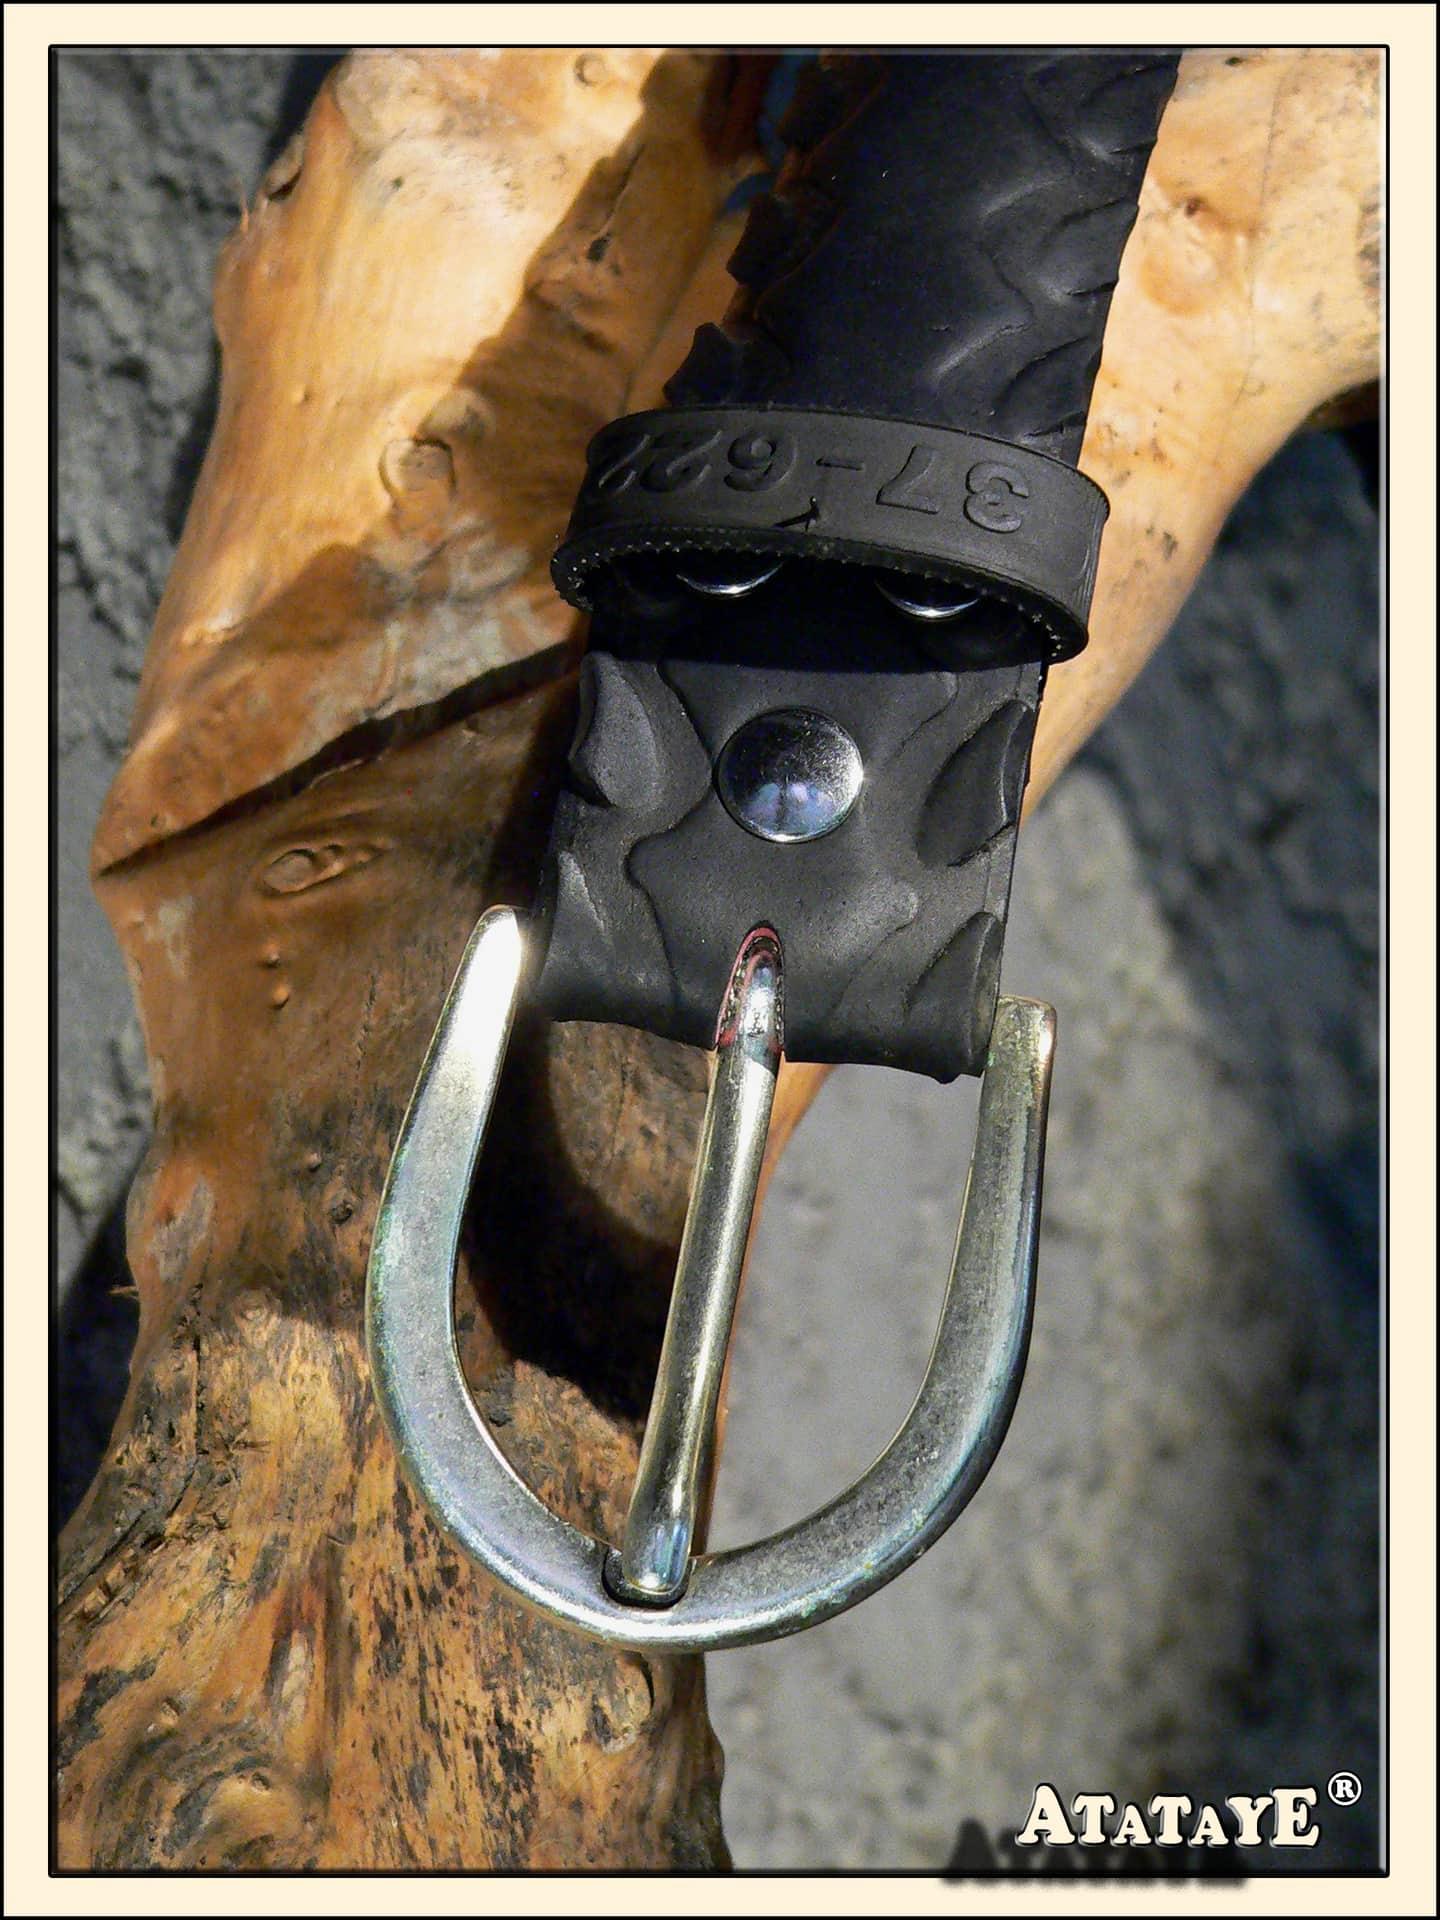 Atataye ceinture-113-ceinture pneu velo-ceinture homme femme enfant-recyclage pneu-creation-bordeaux-upcycling-creation ceinture pneu